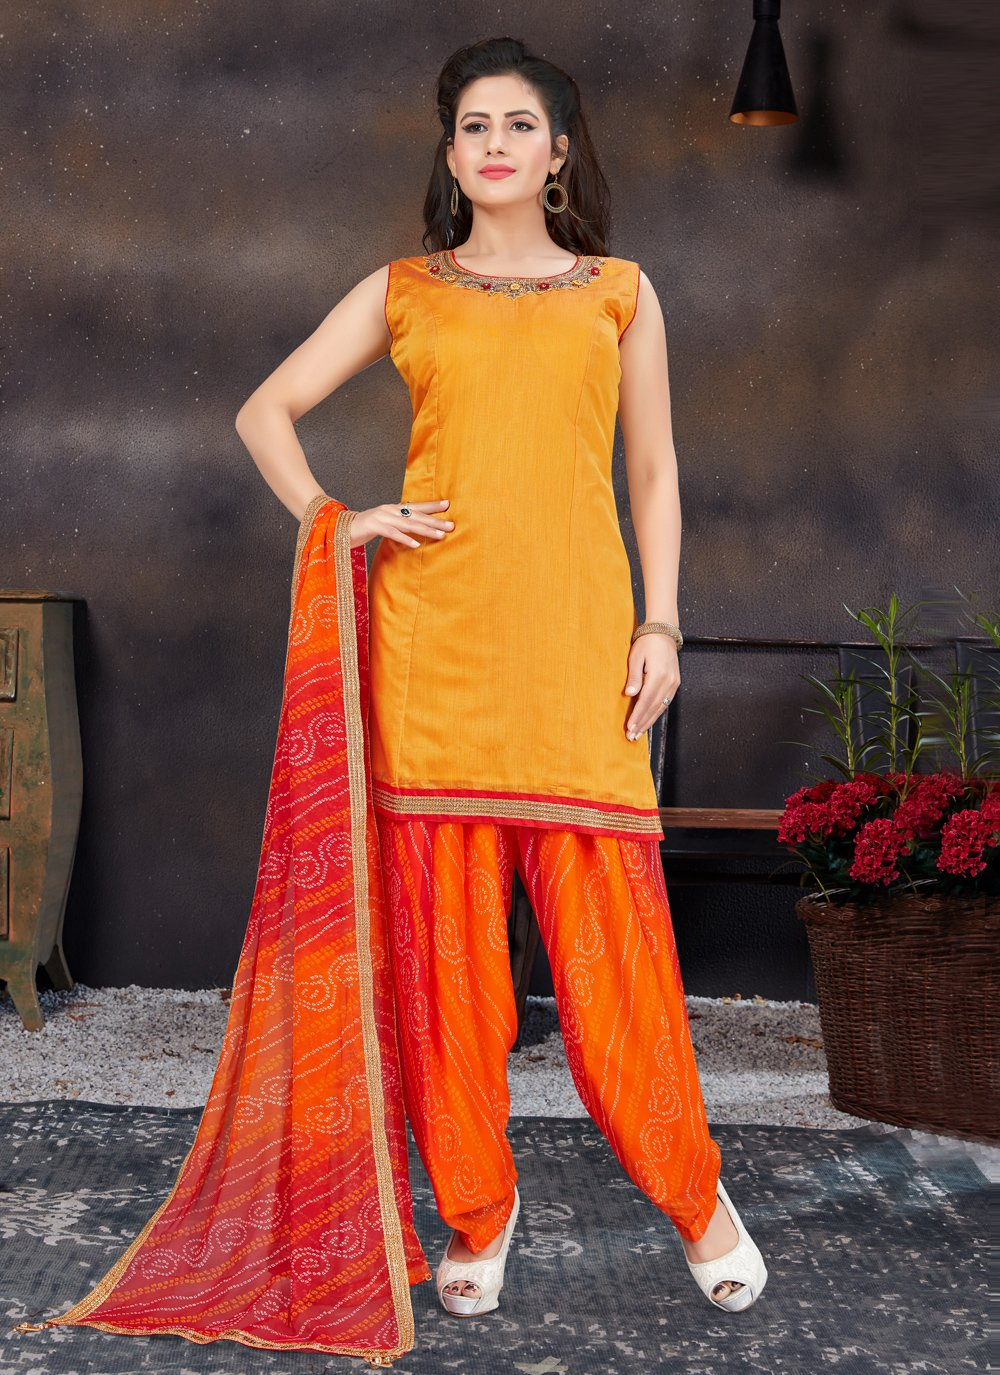 Designer Patiala Suit Handwork Chanderi in Orange and Yellow